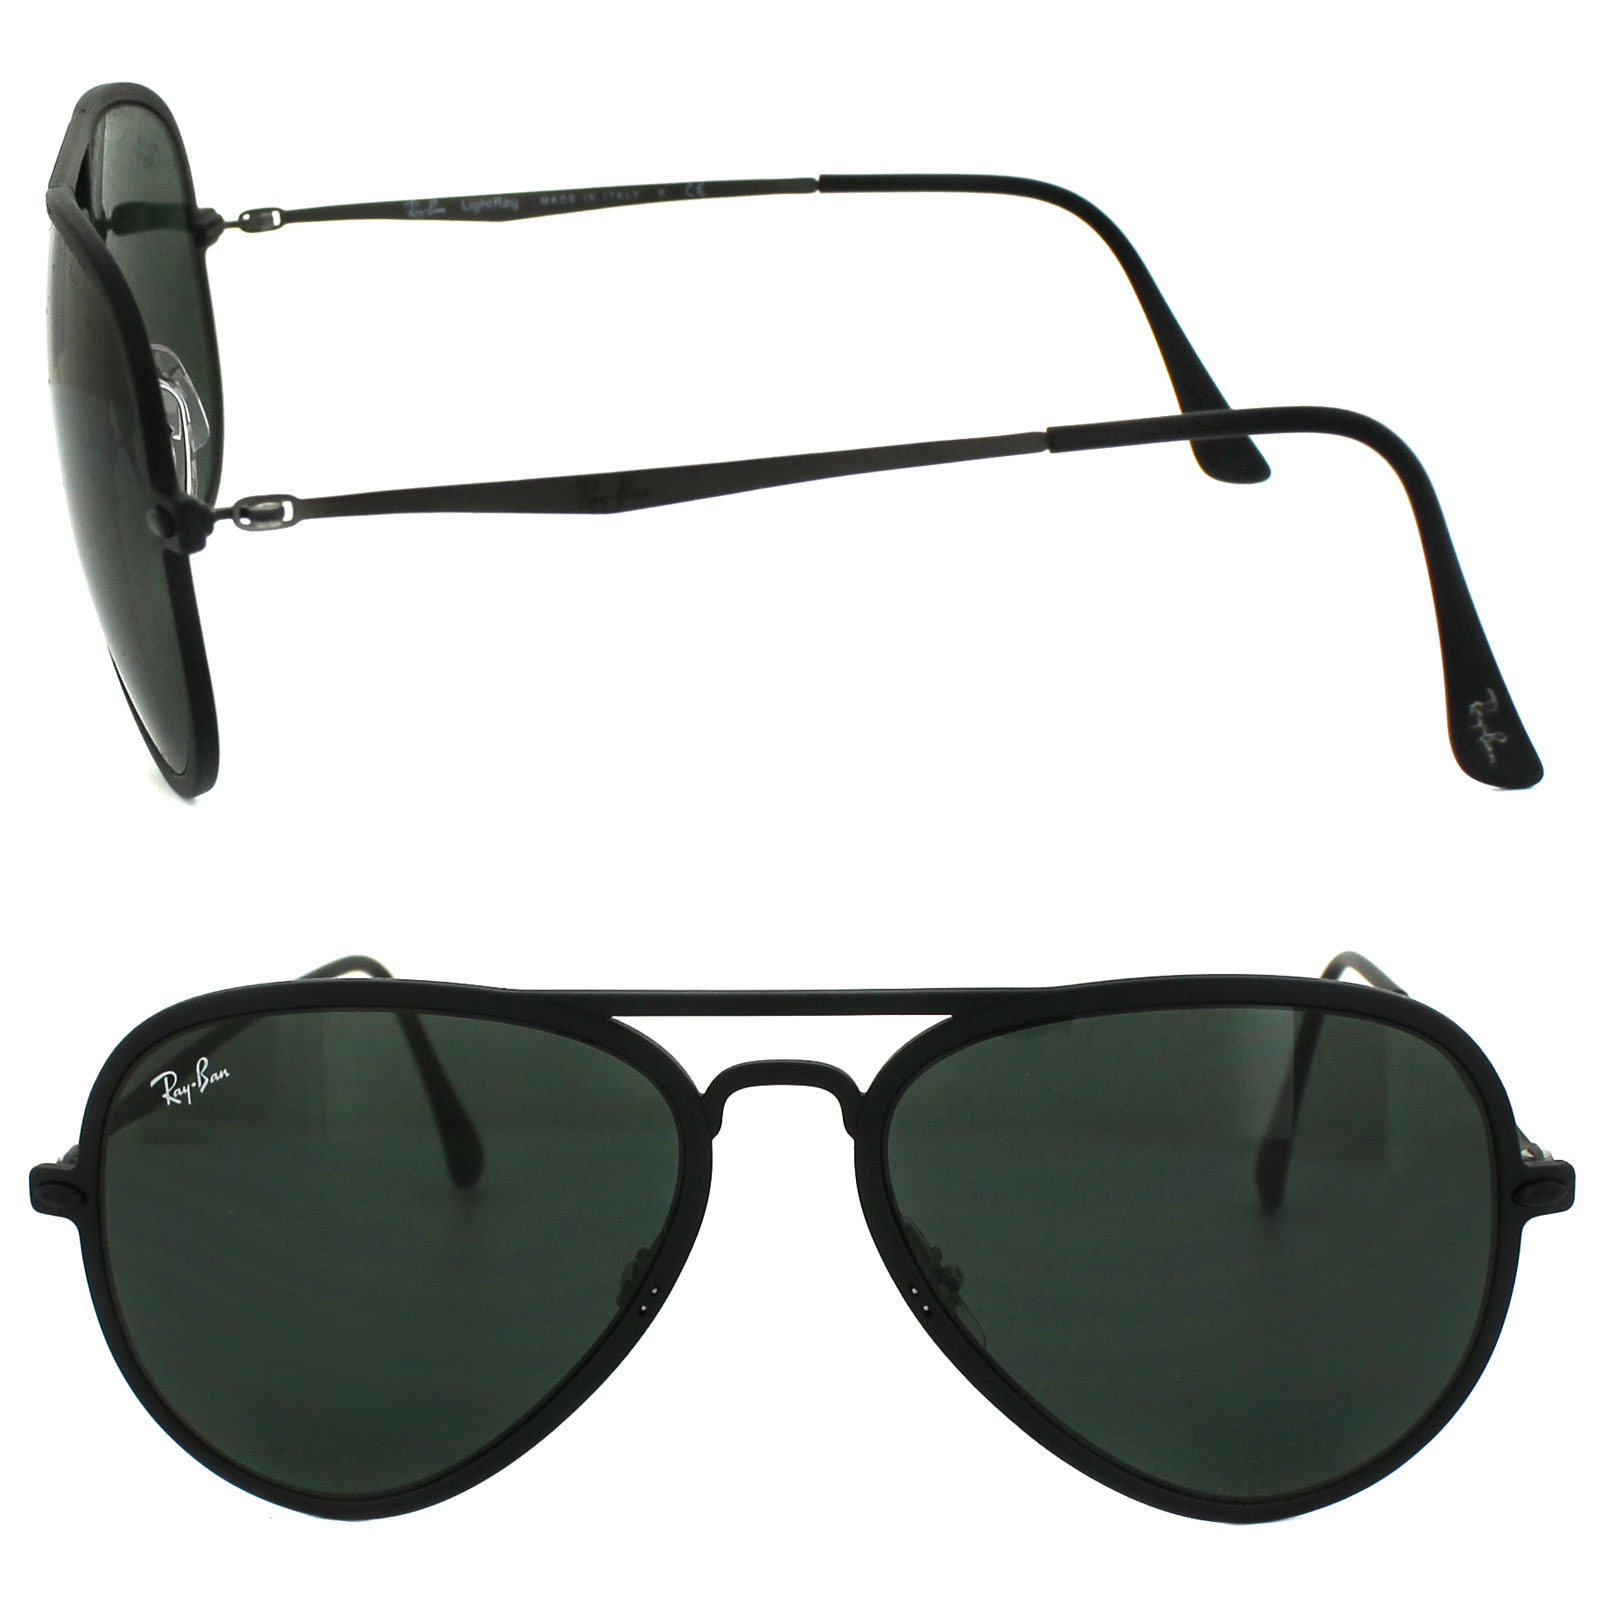 Cheap Ray Ban Aviator Light Ray Ii 4211 Sunglasses Discounted Sunglasses